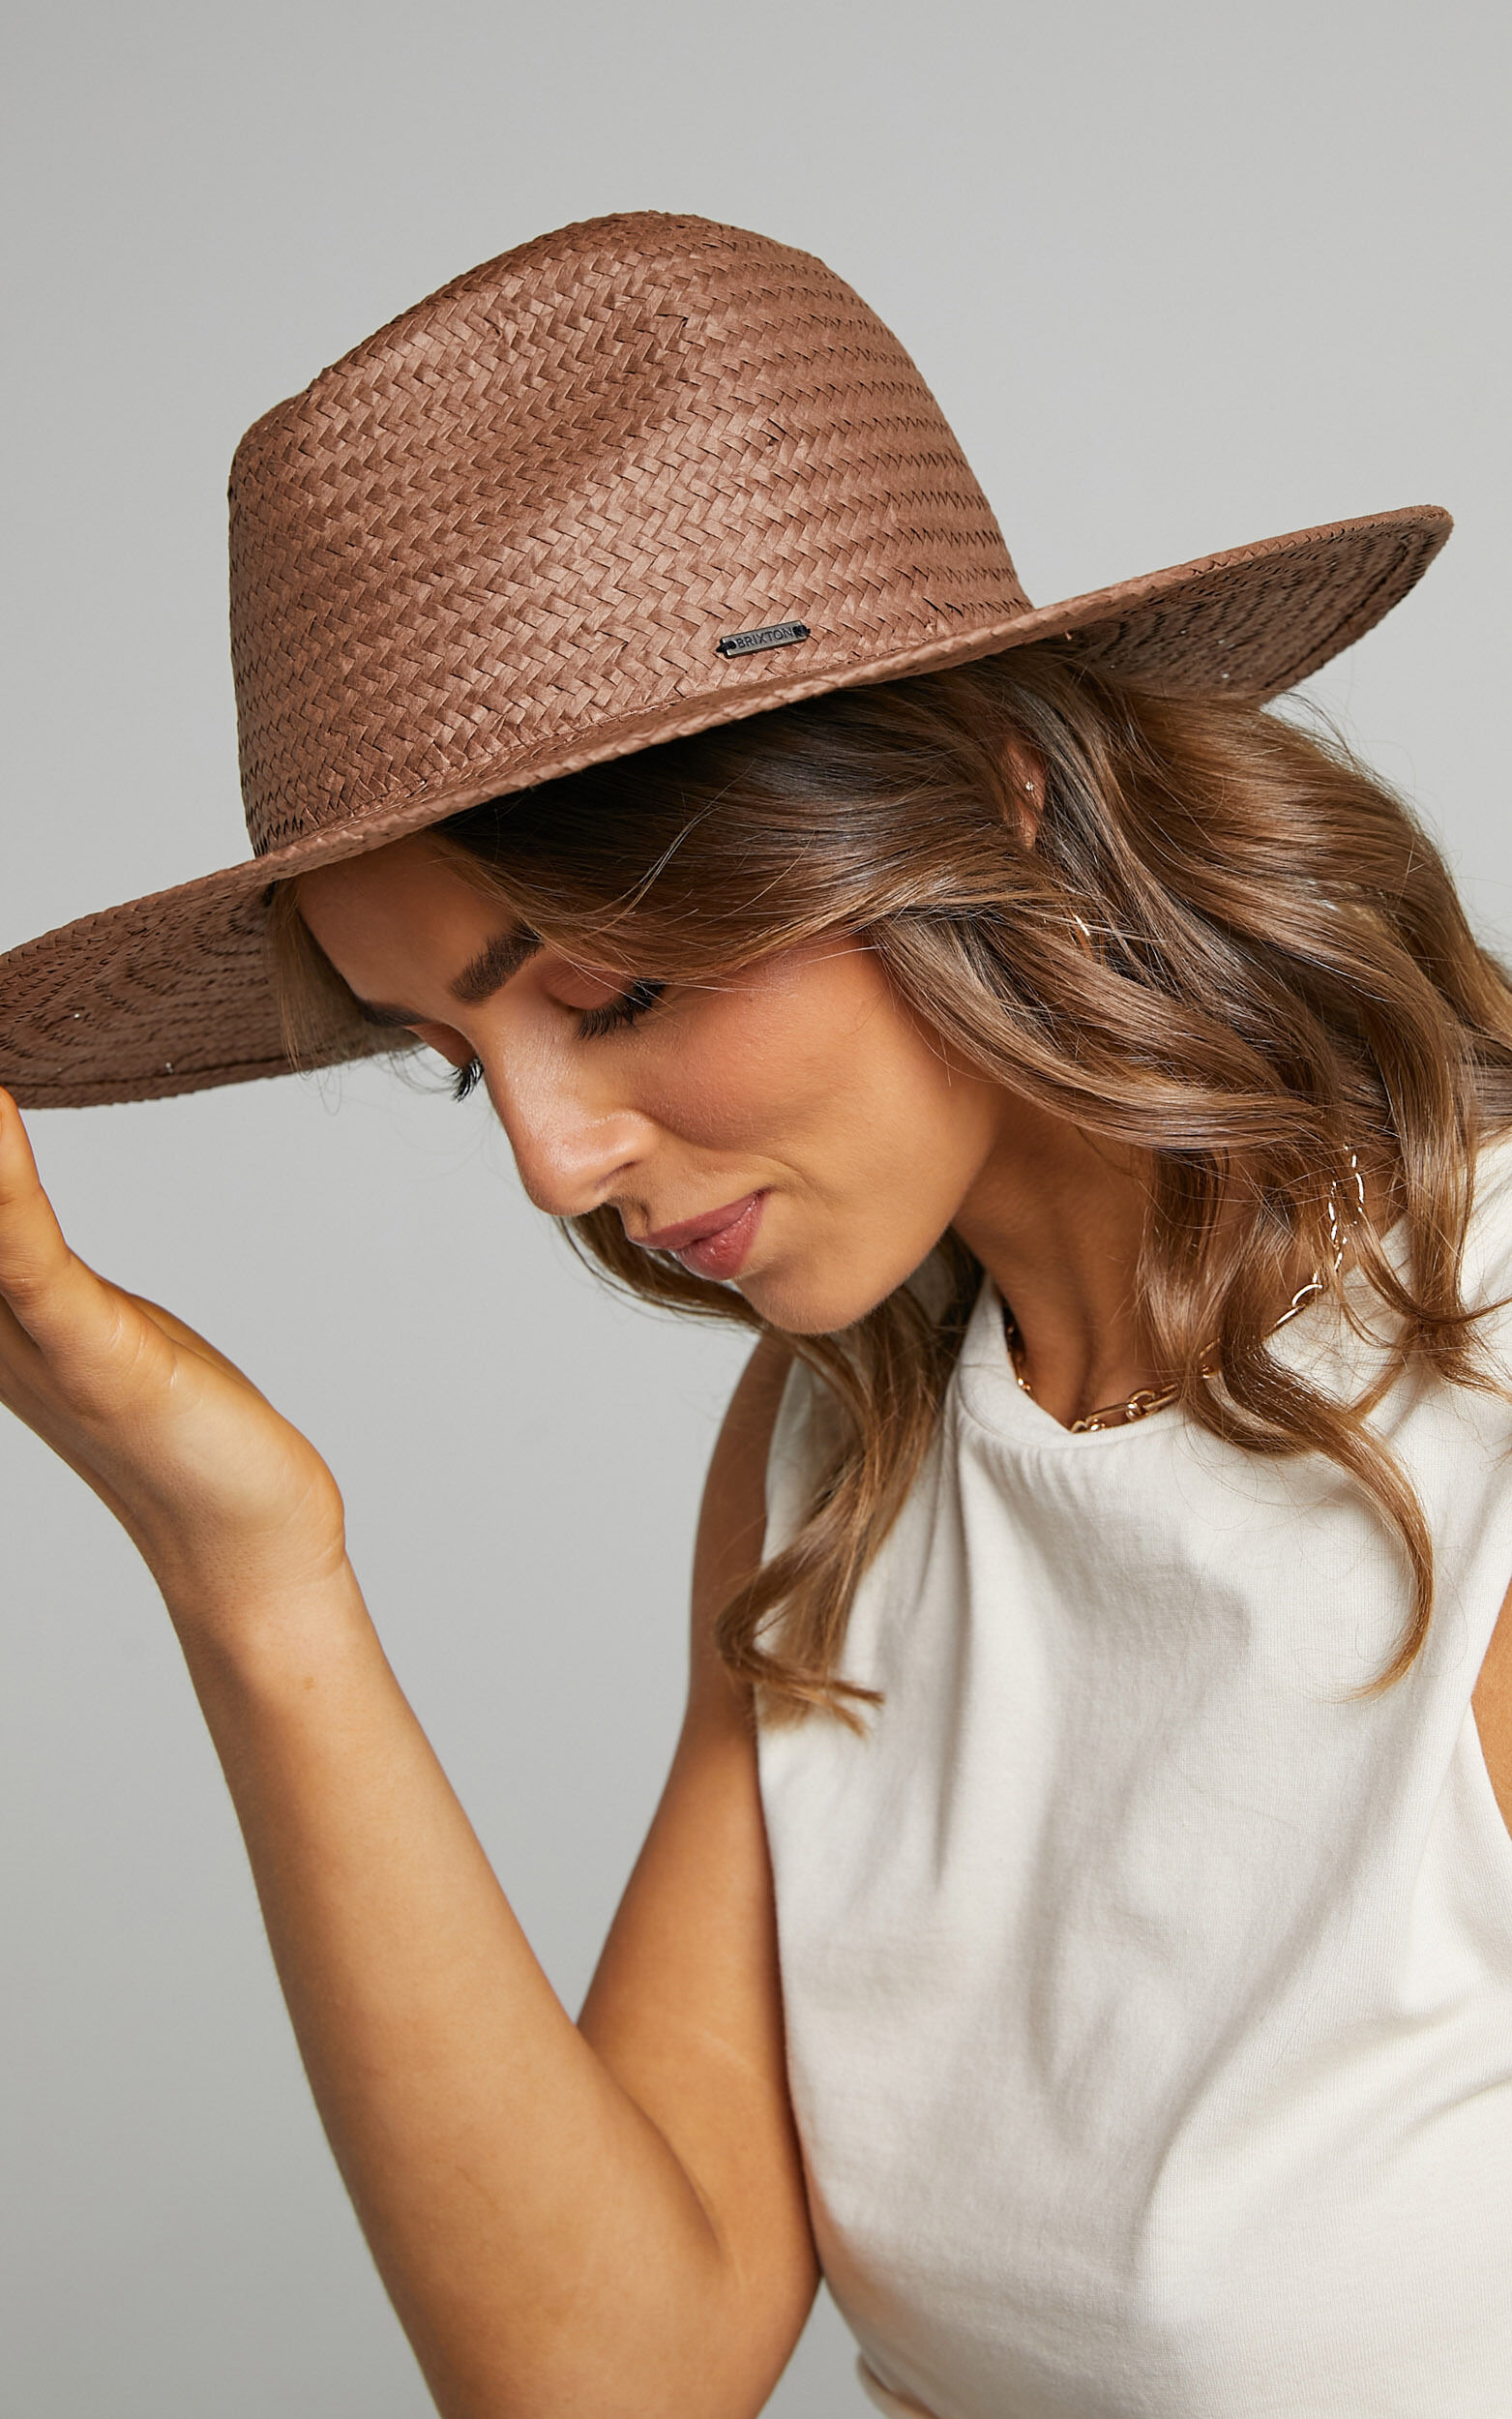 Brixton - Seaside Sun Hat in Brown - M/L, BRN1, super-hi-res image number null